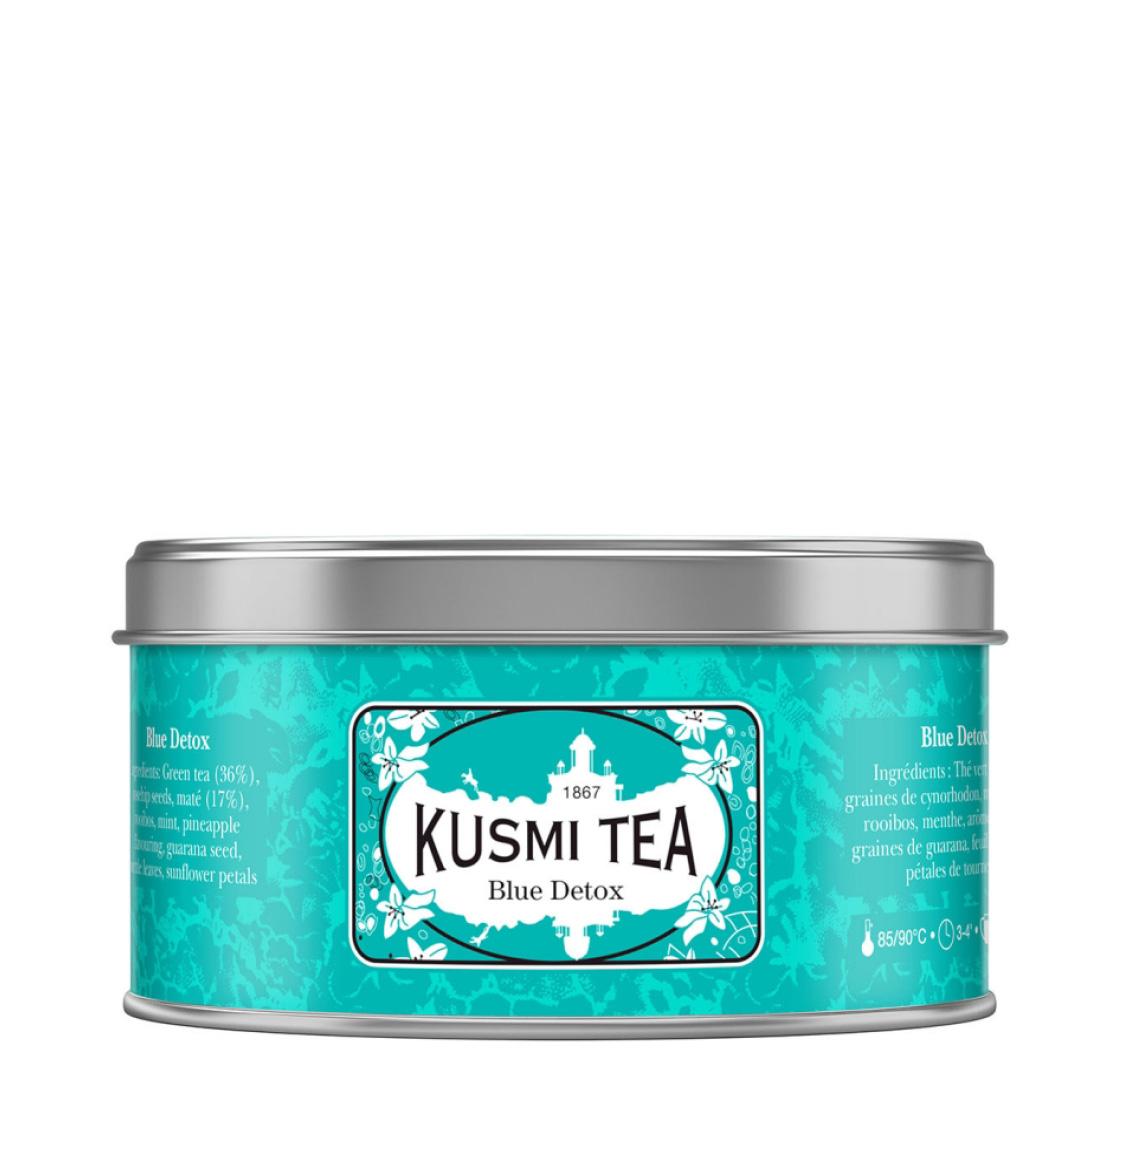 Kusmi Tea Blue Detox 125g